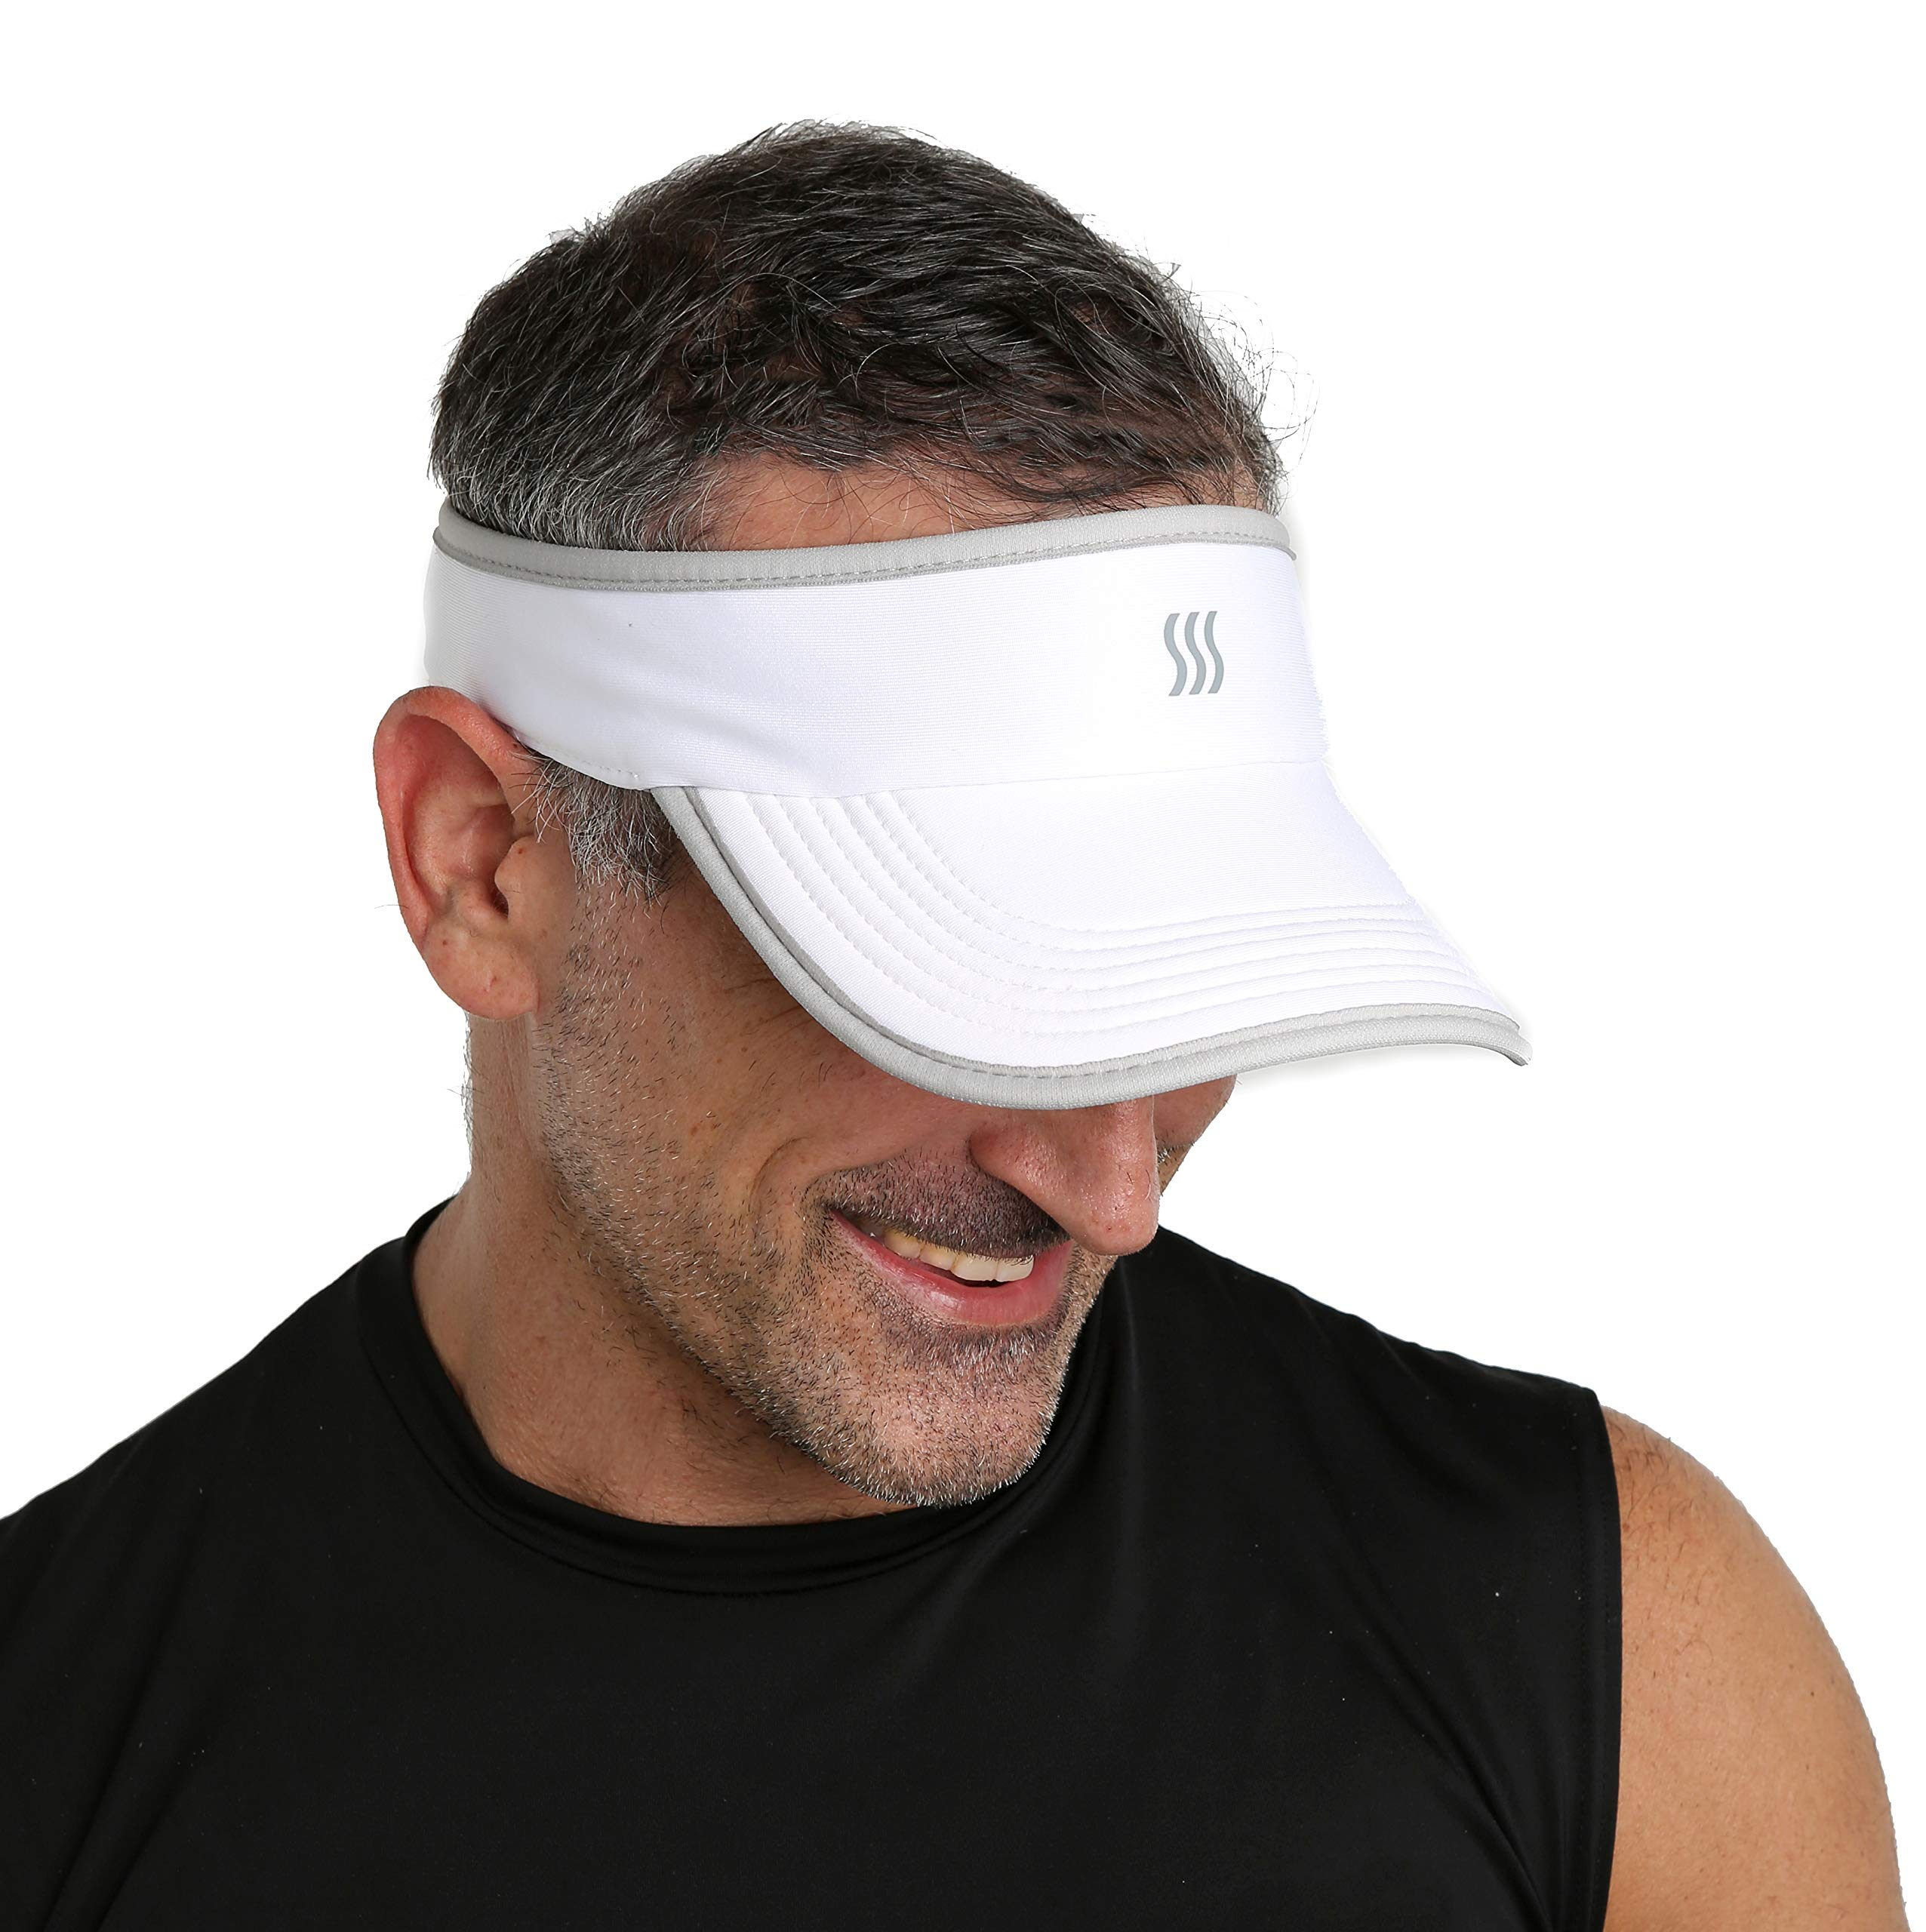 Men's Super Absorbent Sports Visor. Fully Adjustable & Nonslip